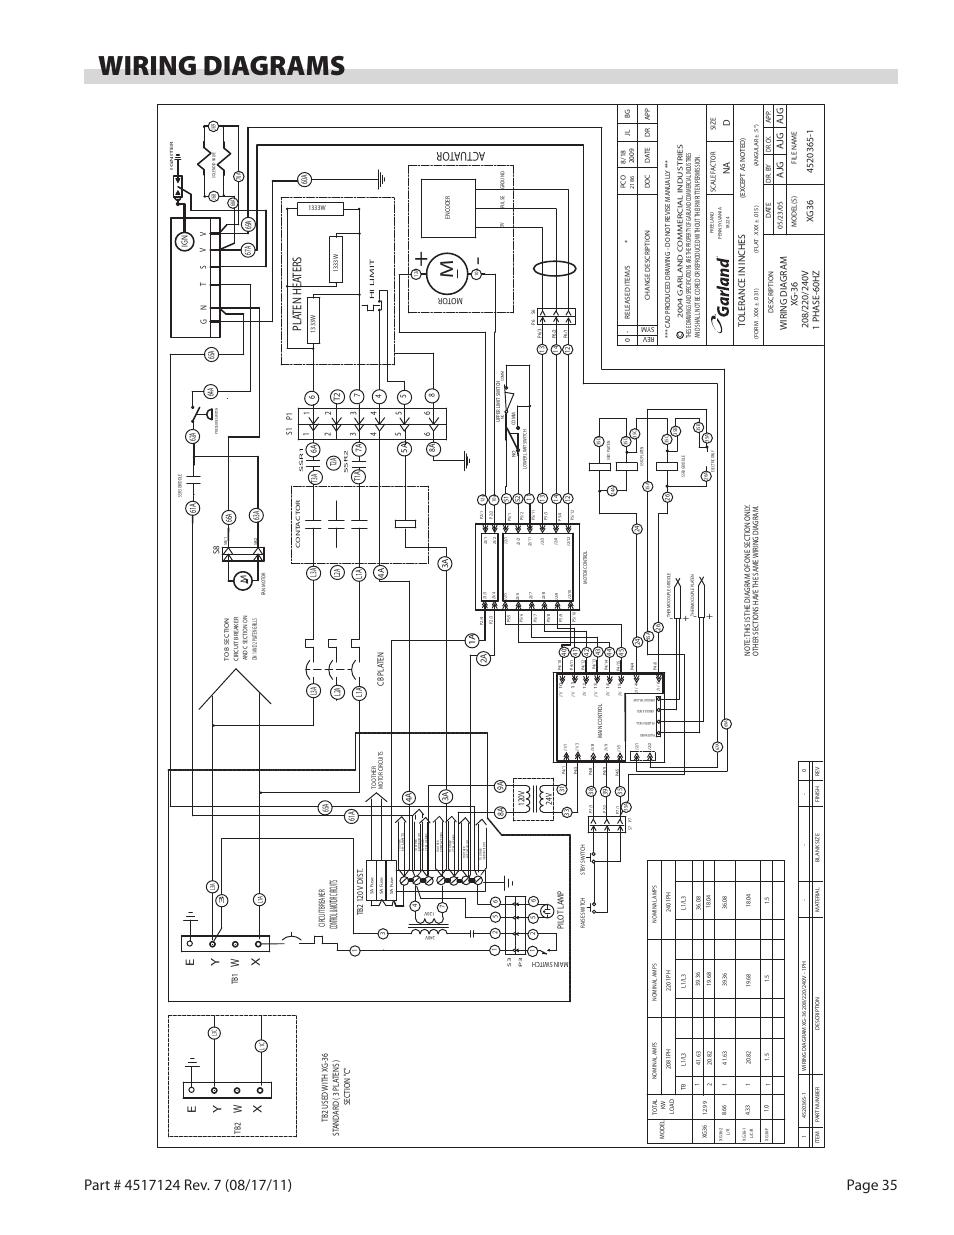 wiring diagrams actu ator pla ten hea ters garland xg36 gas rh modes d emploi com garland master 200 wiring diagram garland sdg-1 wiring diagram